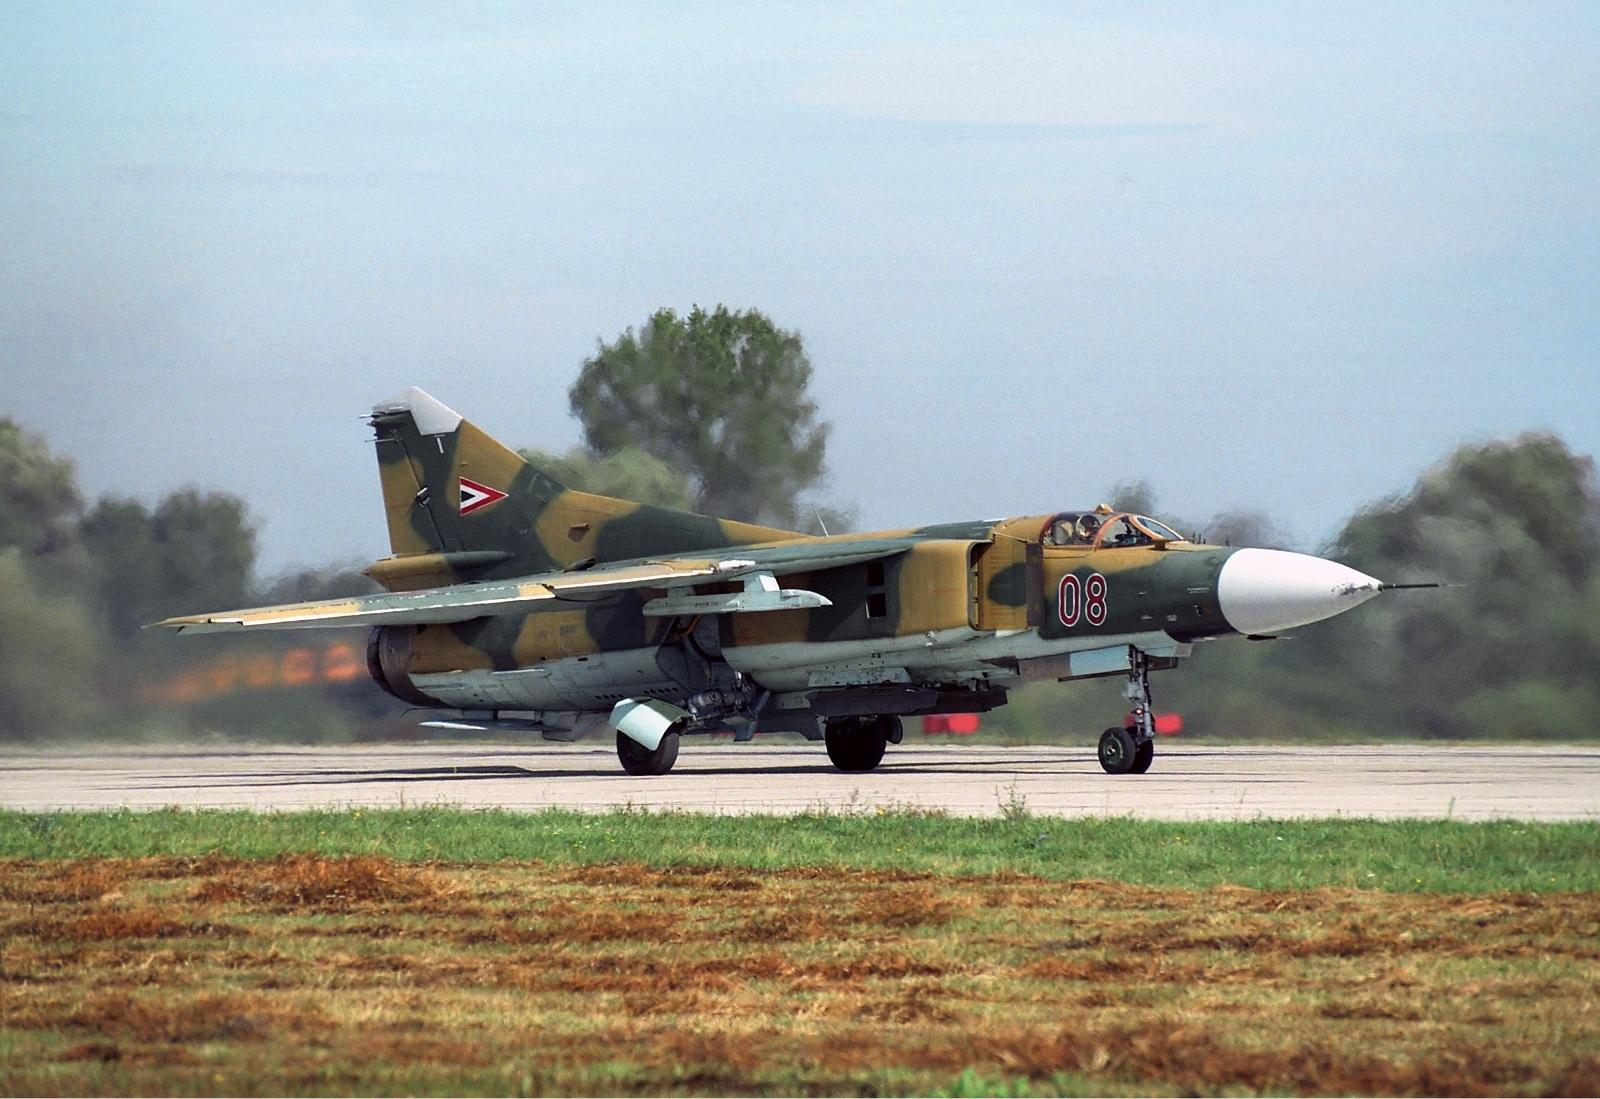 Hungarian_Air_Force_Mikoyan-Gurevich_MiG